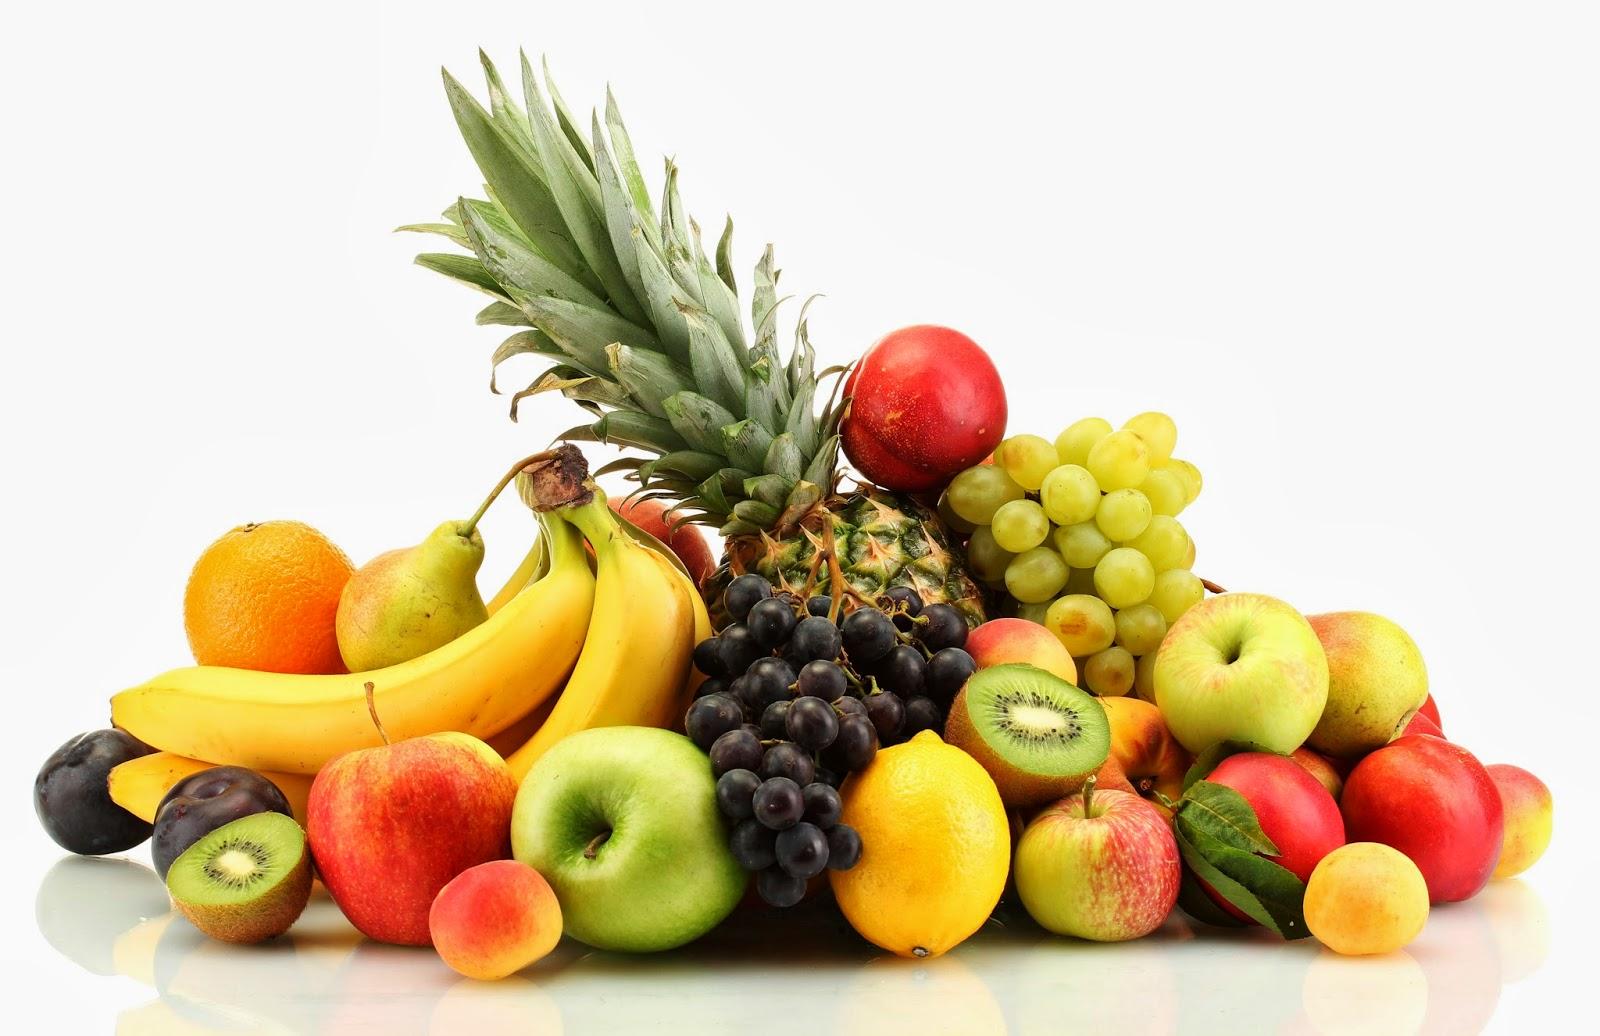 Kuisioner pola makan sehat